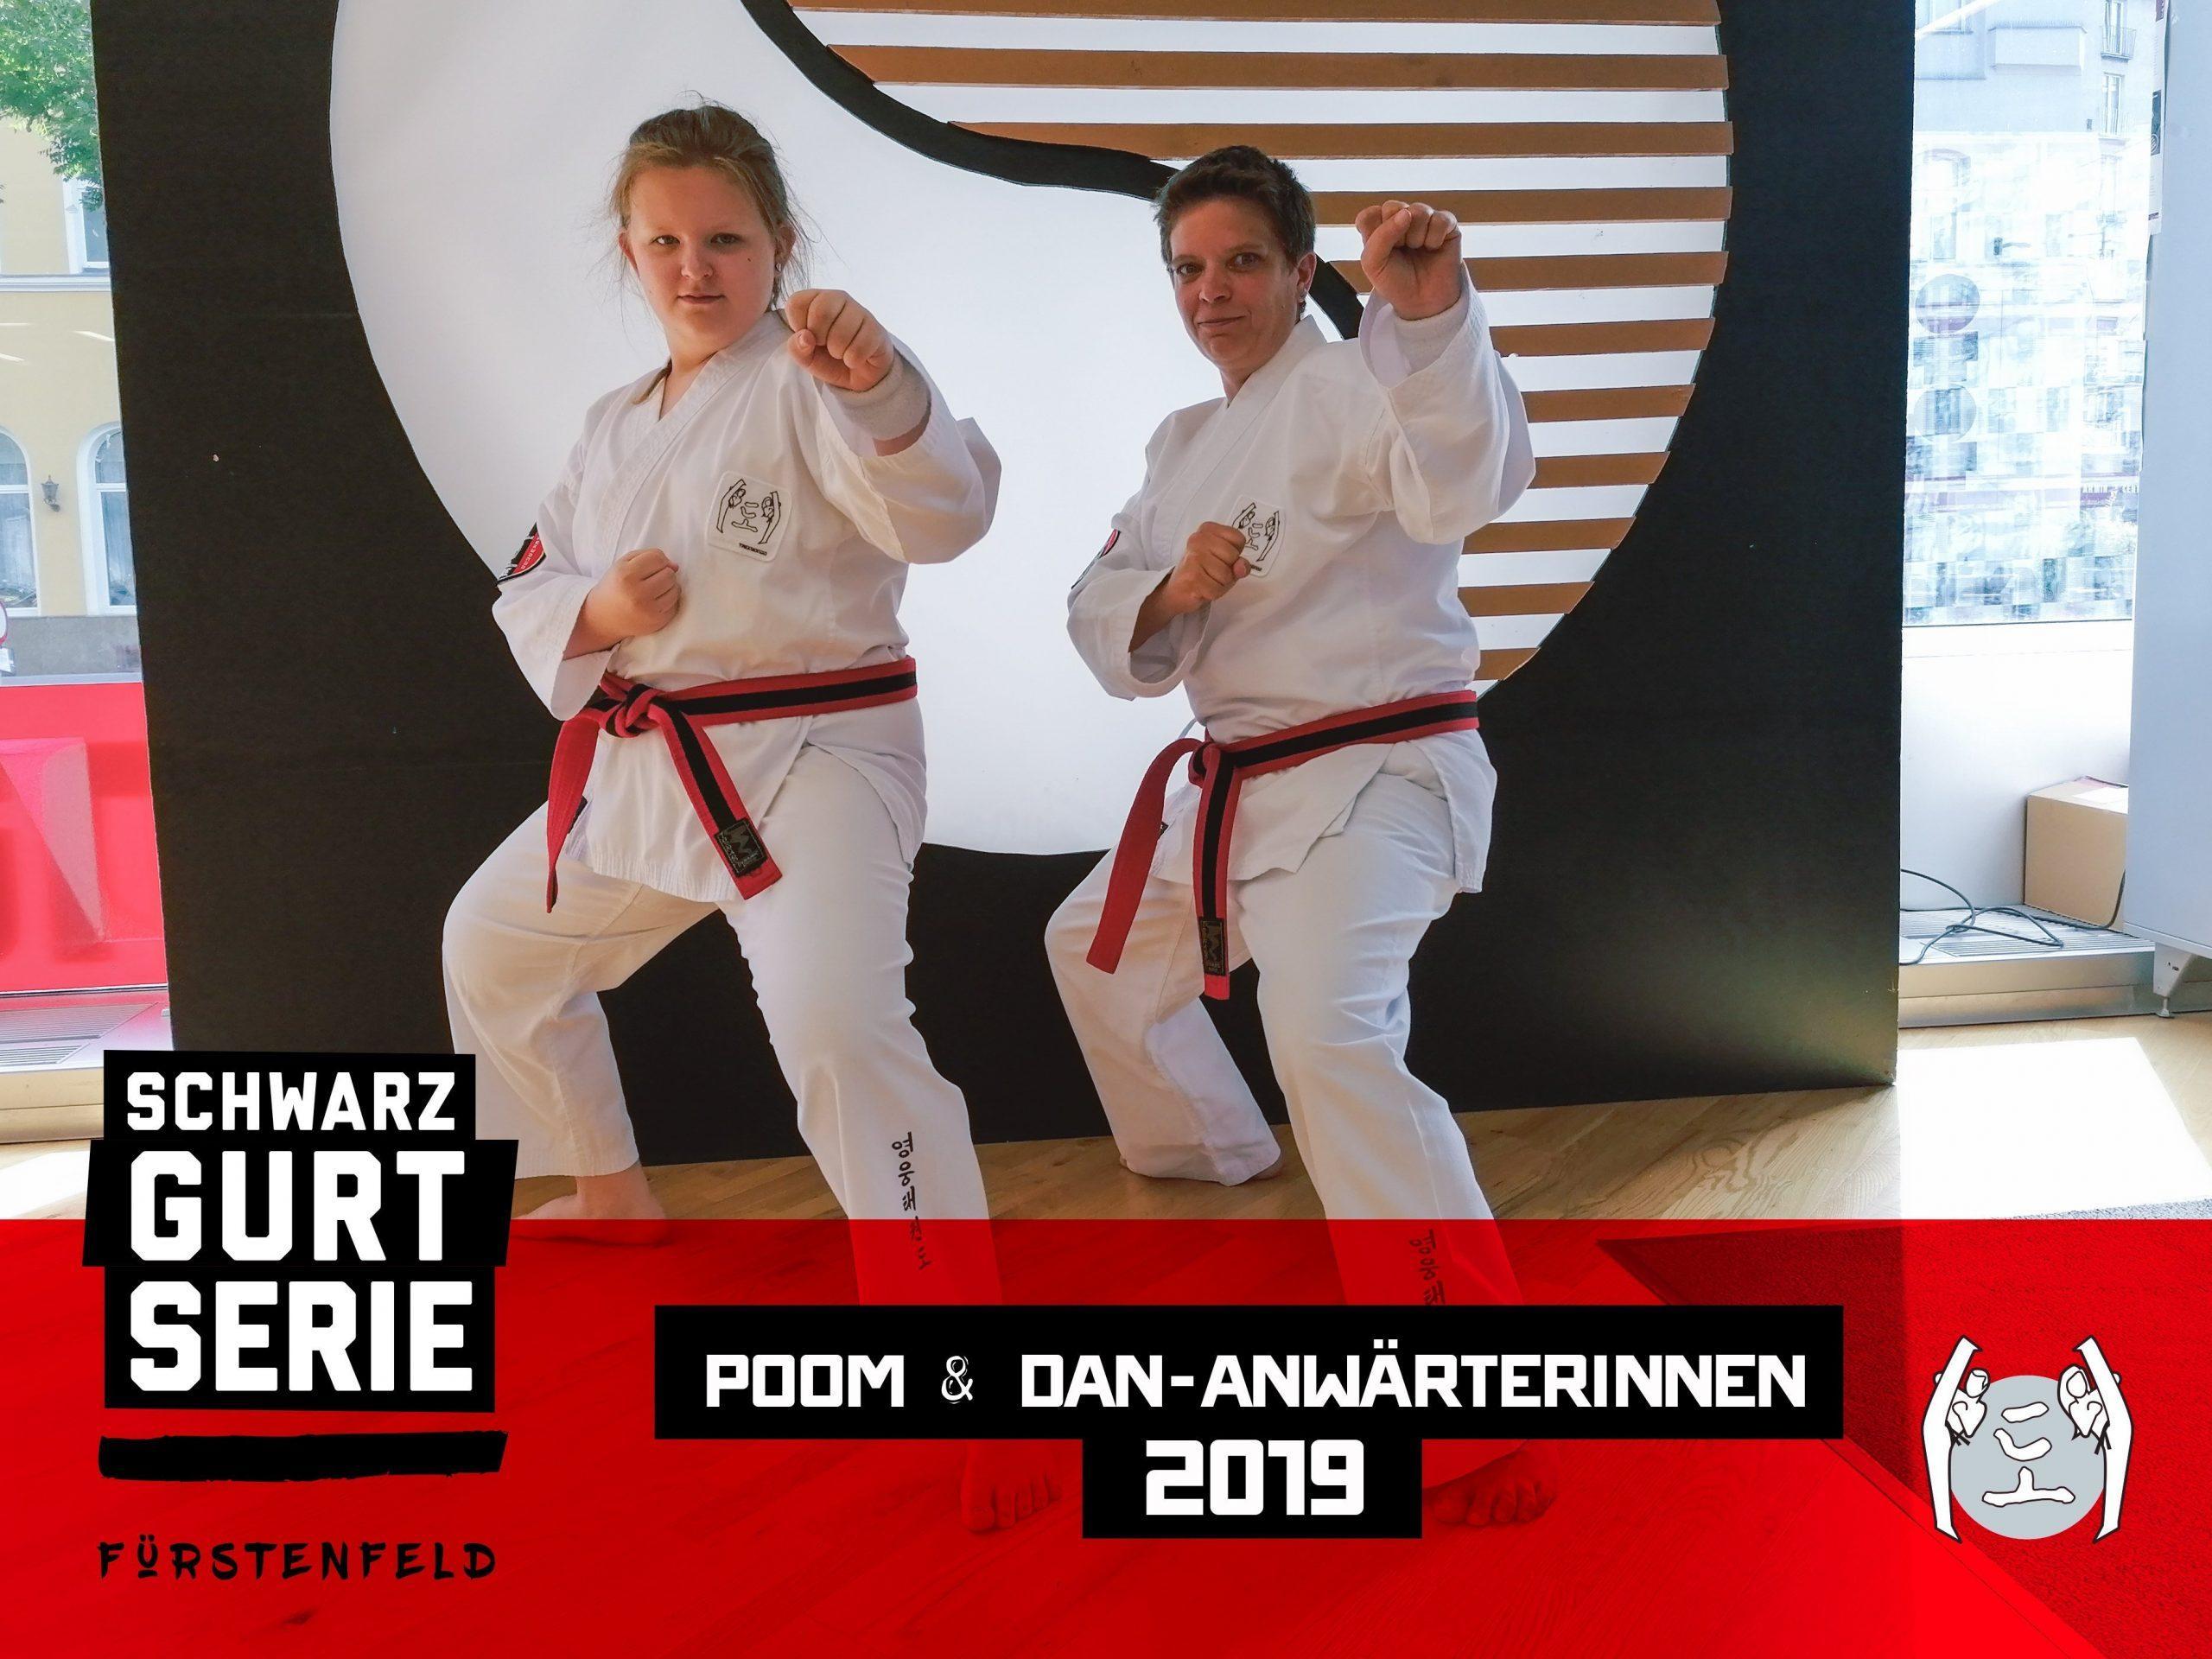 YOUNG-UNG Taekwondo Kampfsport Trainings Camp Jufa Fürstenfeld